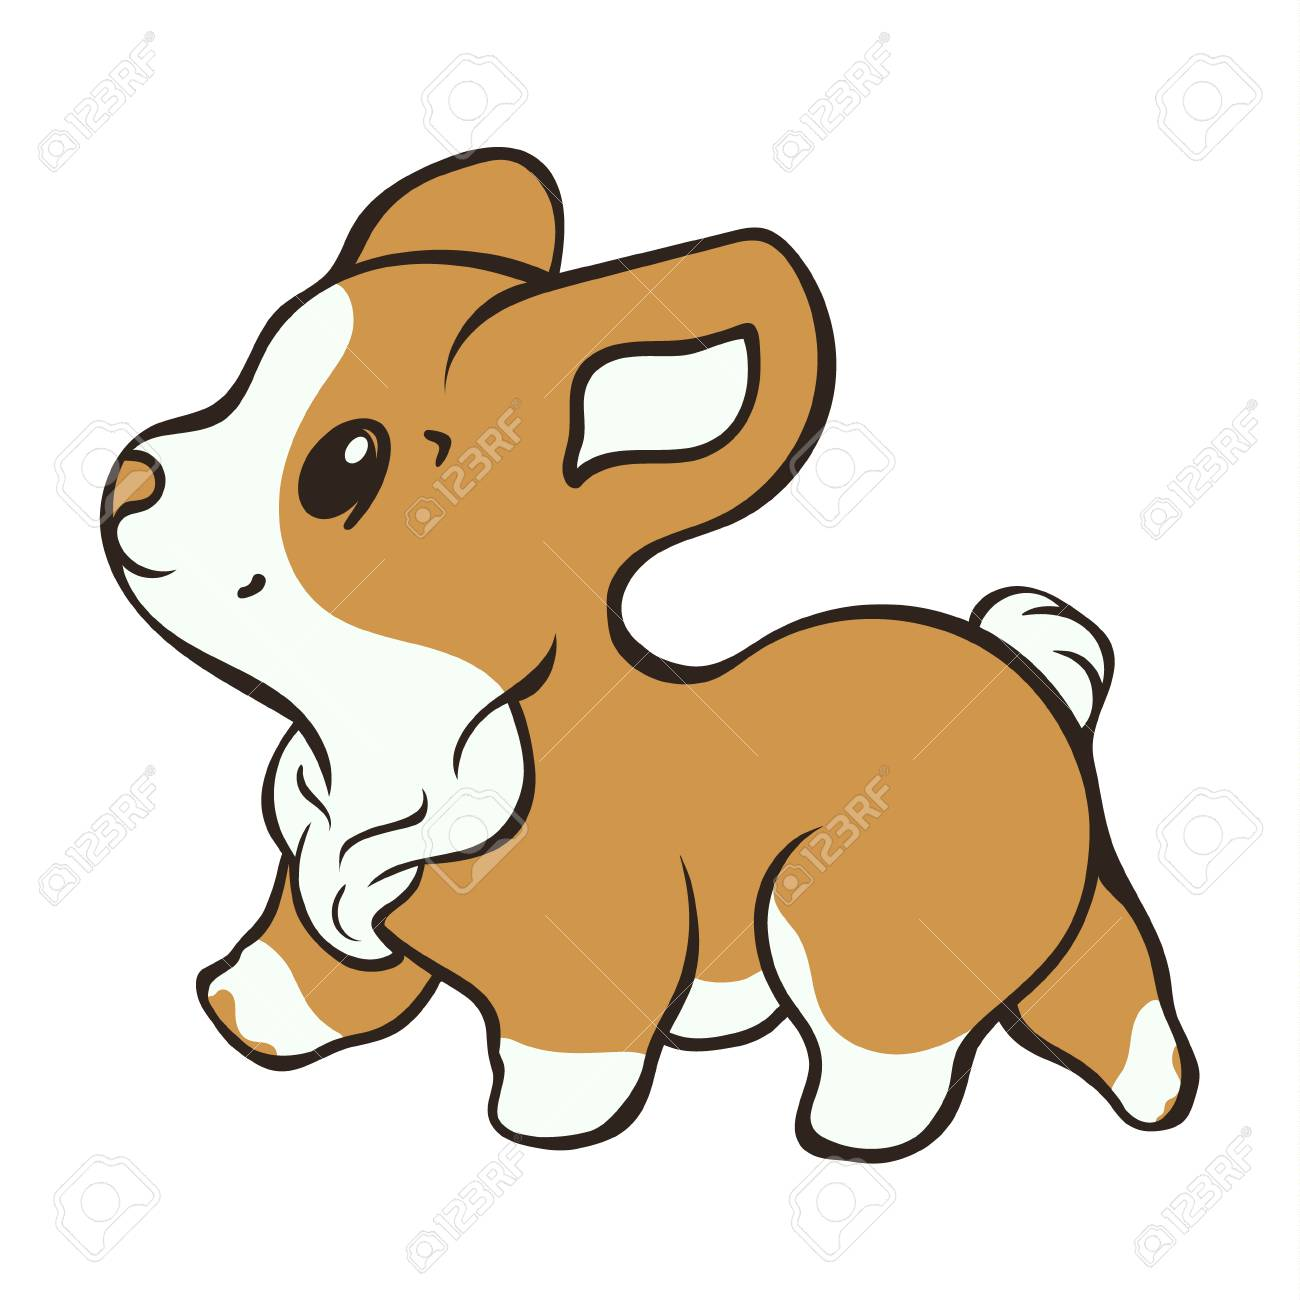 Welsh Corgi Dog Breed Vector Illustration Cute Puppy Walk Side Royalty Free Cliparts Vectors And Stock Illustration Image 121868717